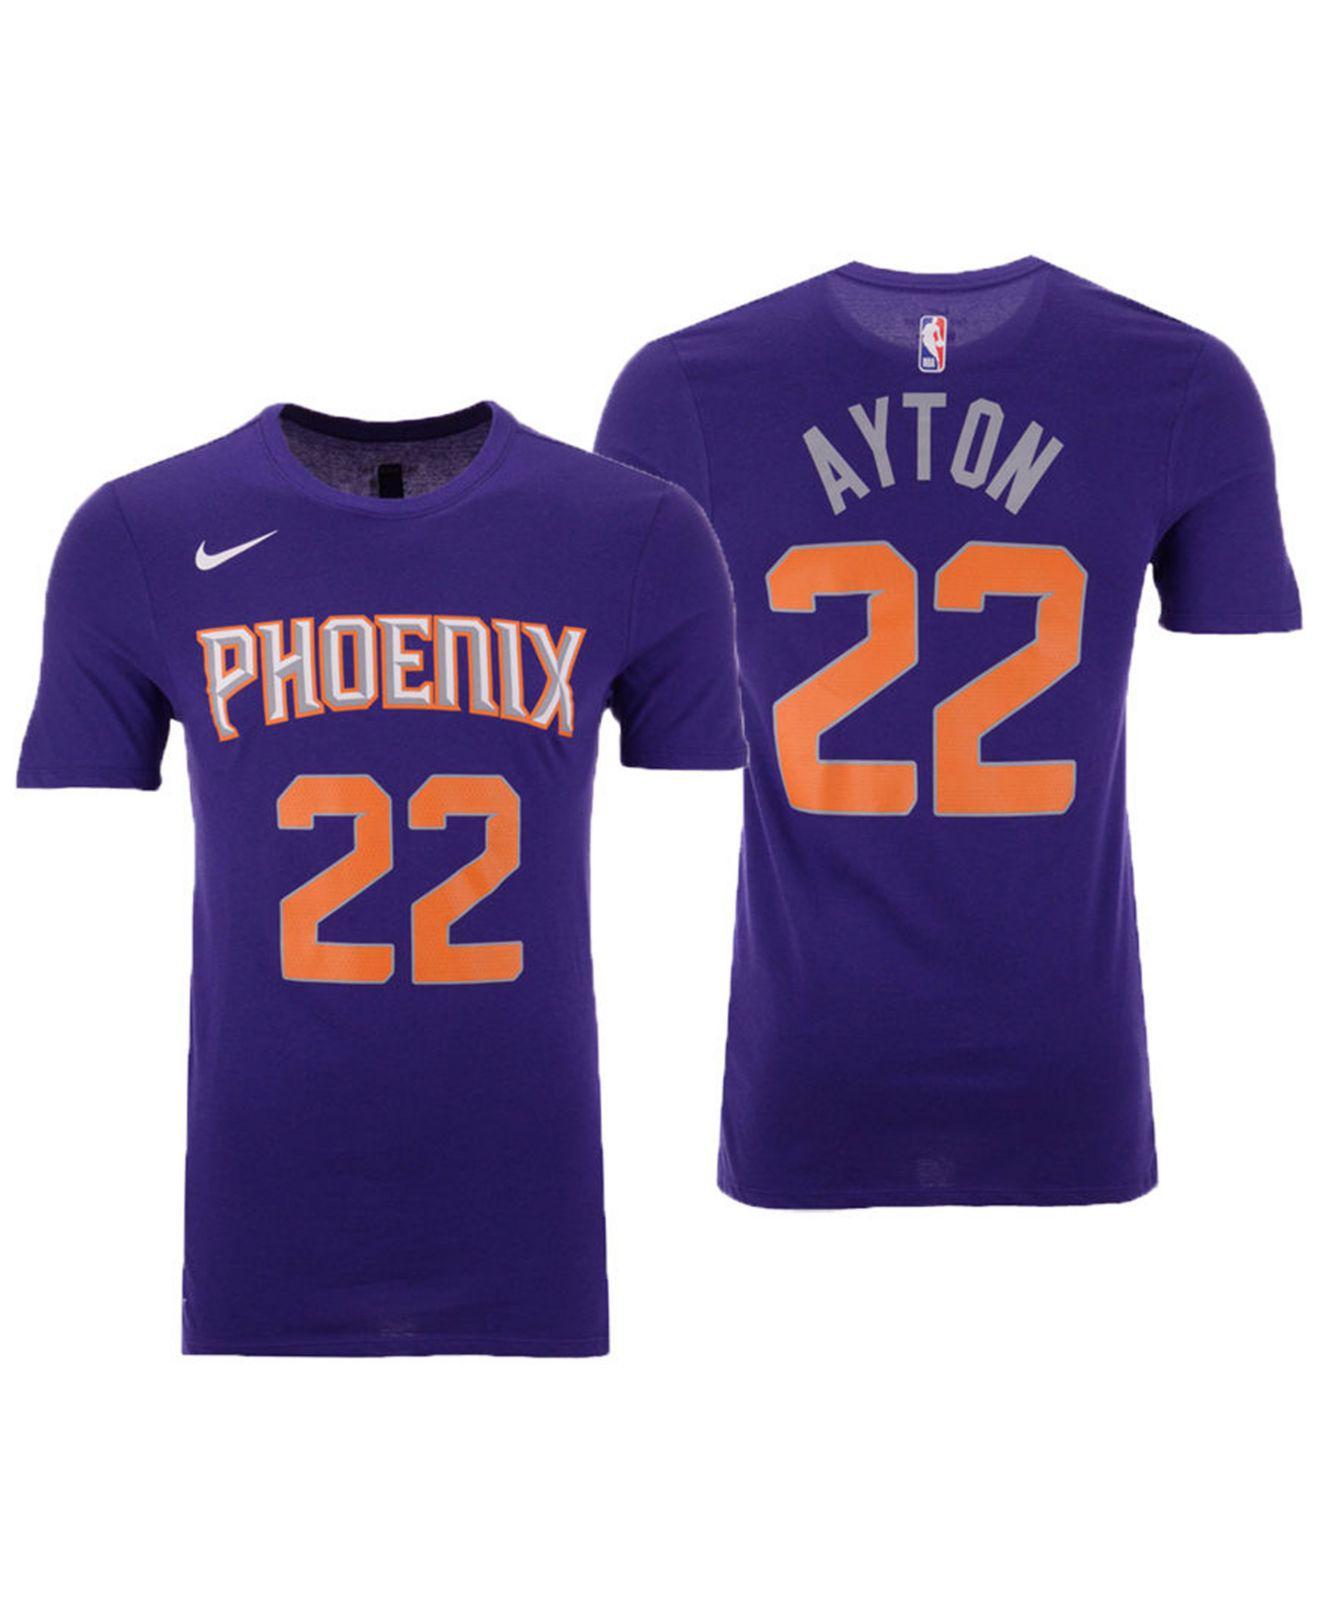 604a49f0c6fb Lyst - Nike Deandre Ayton Phoenix Suns Icon Player T-shirt in Purple ...